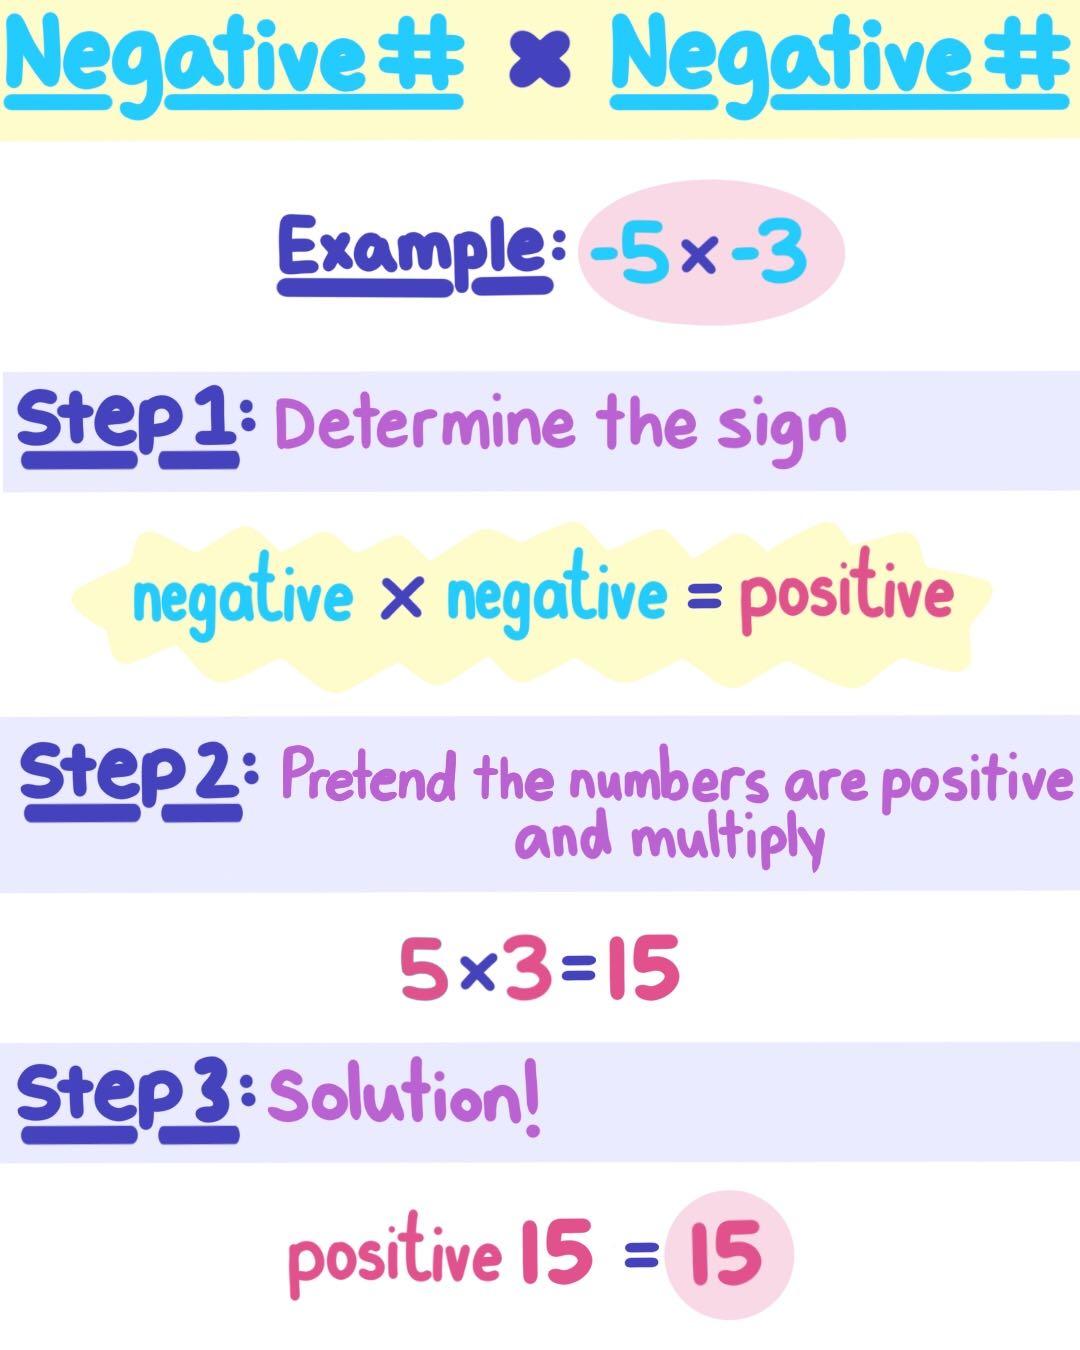 Multiplying Negatives By Negatives